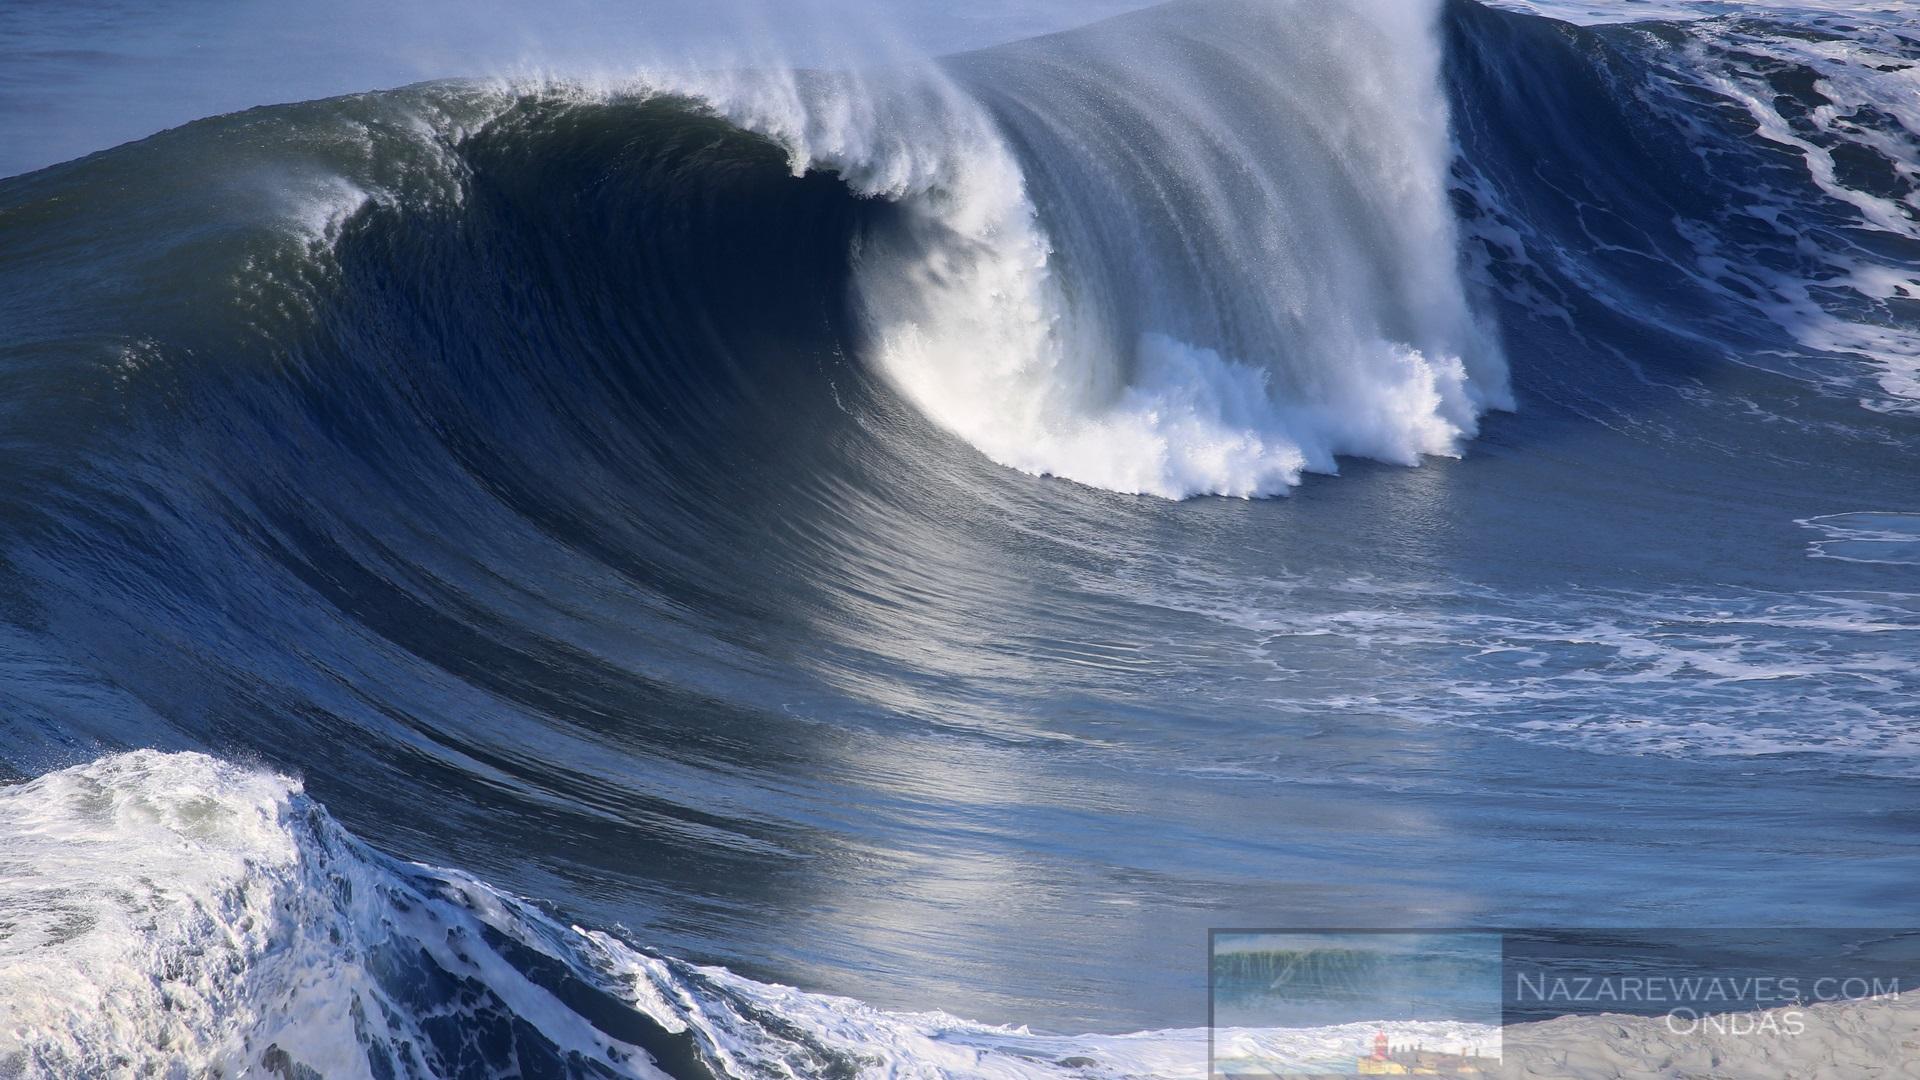 Adult waves